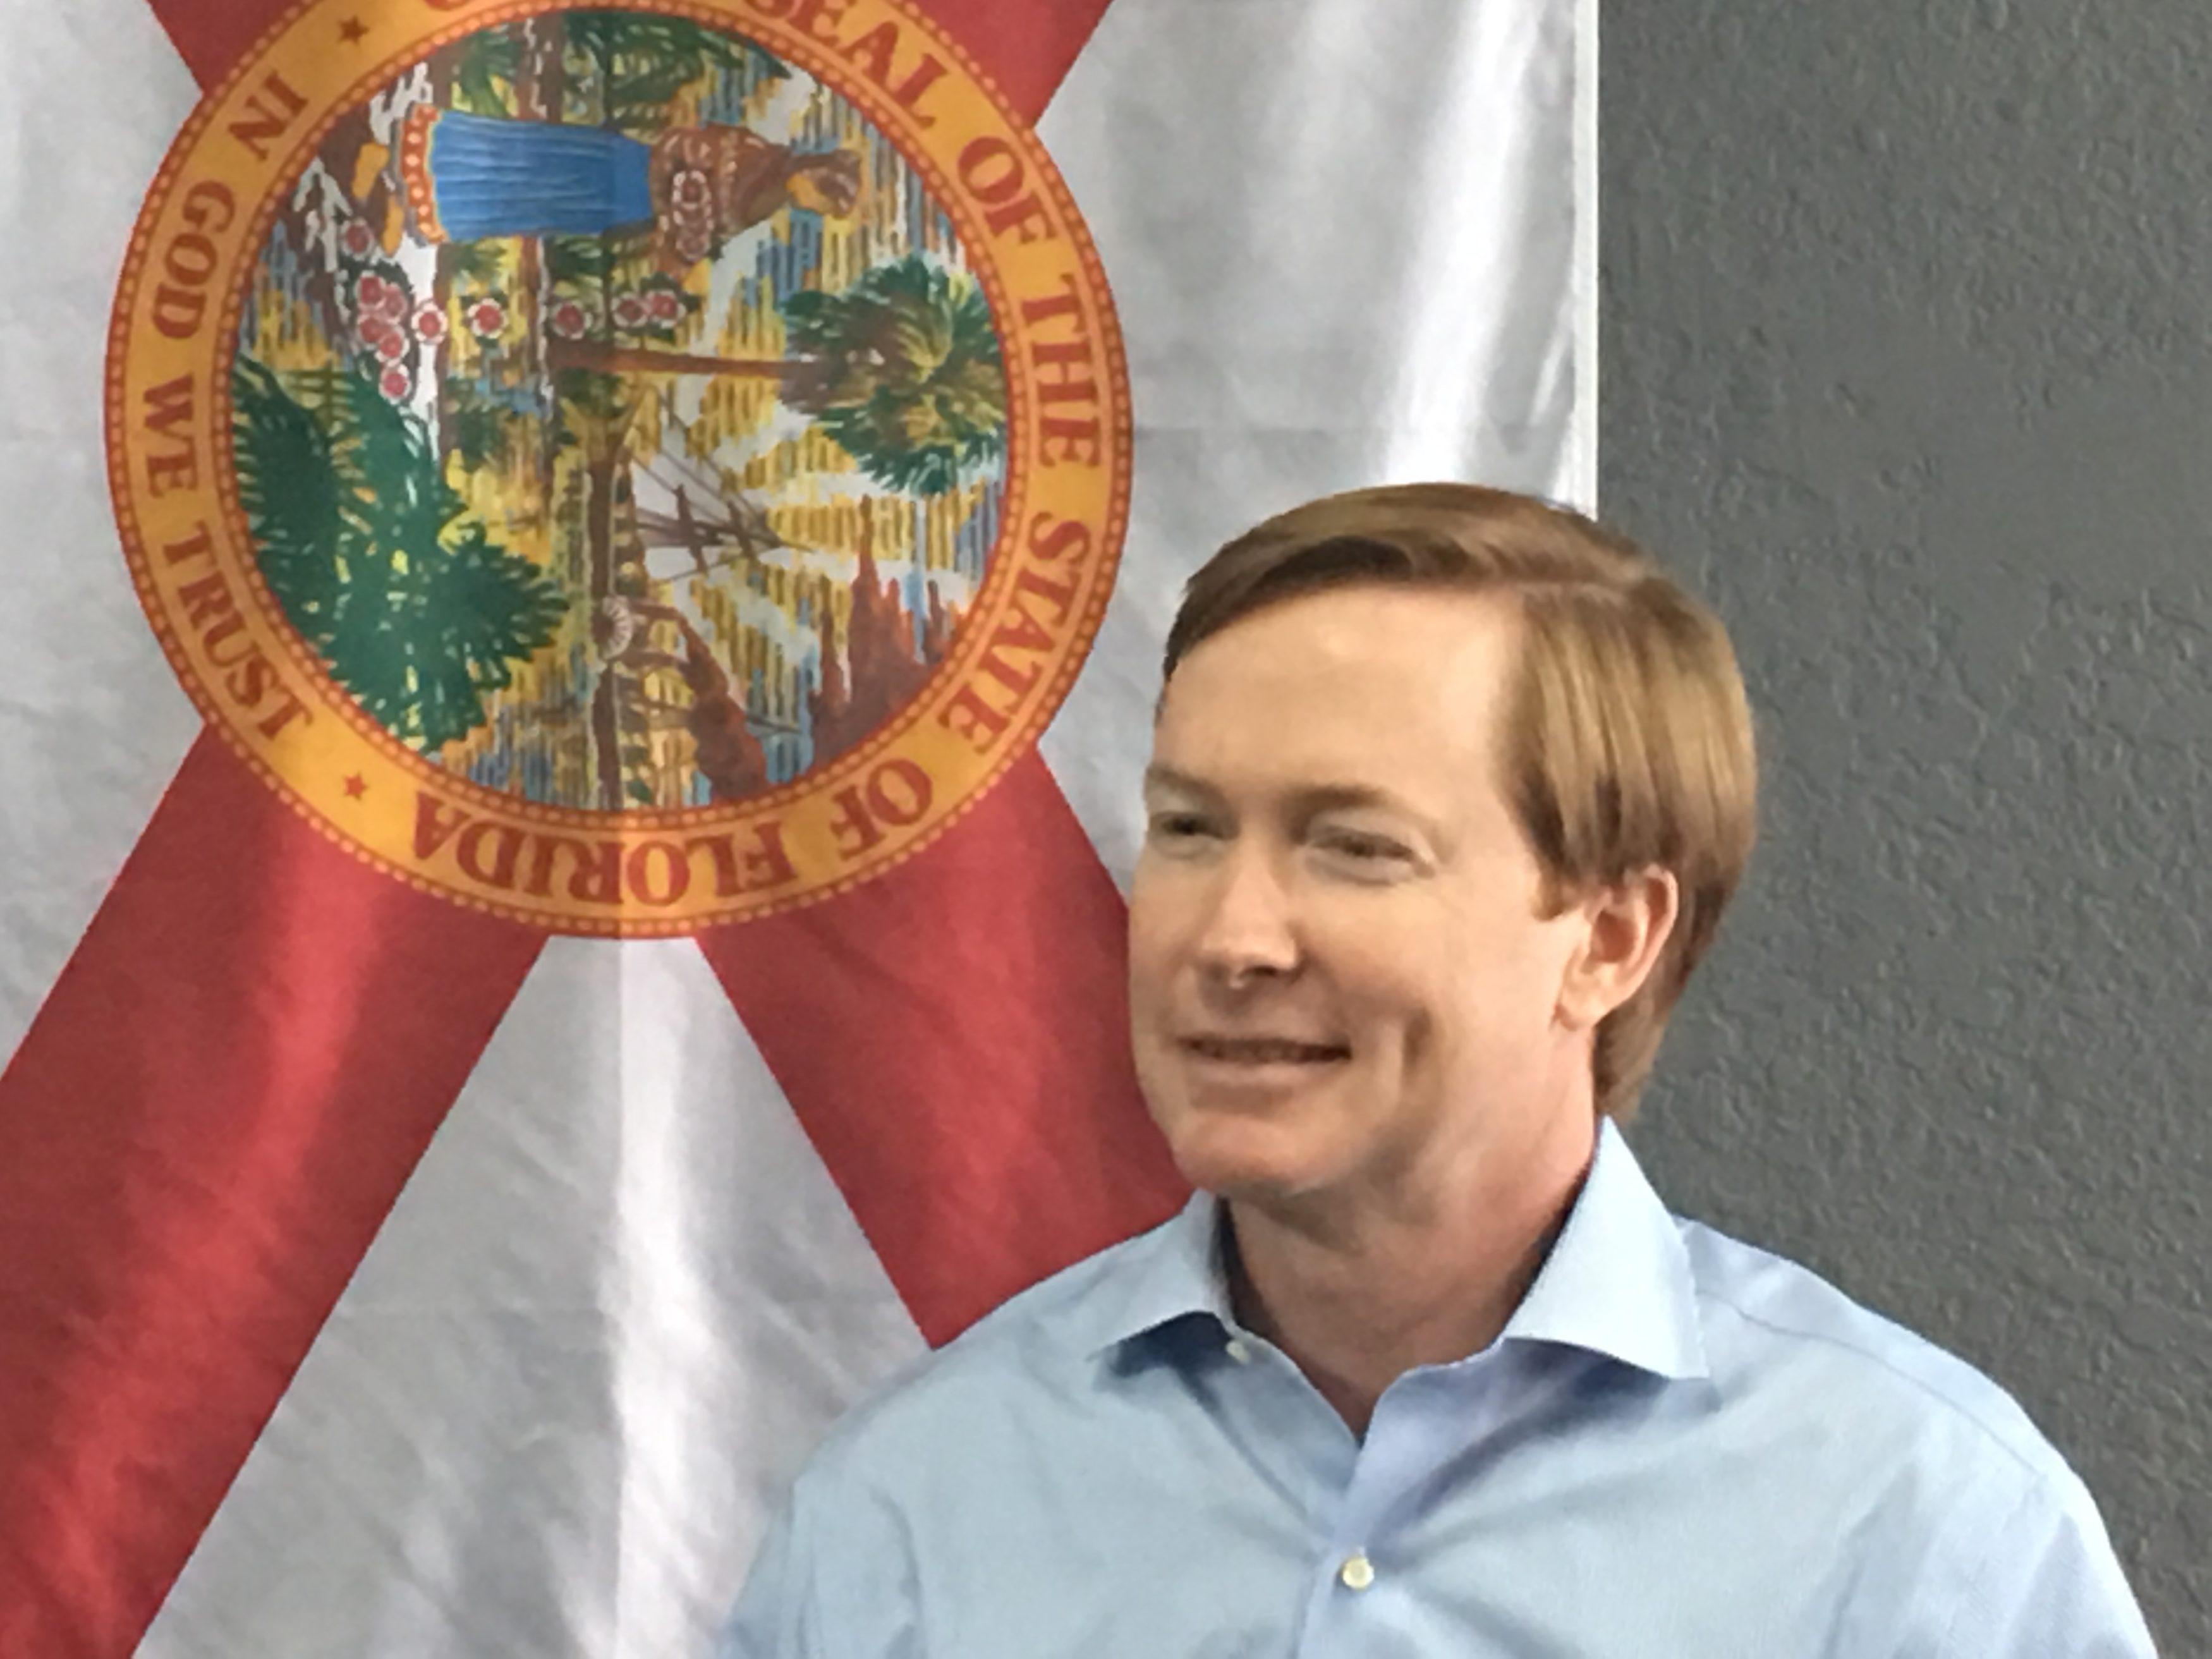 Adam-Putnam-Florida-3500x2625.jpg